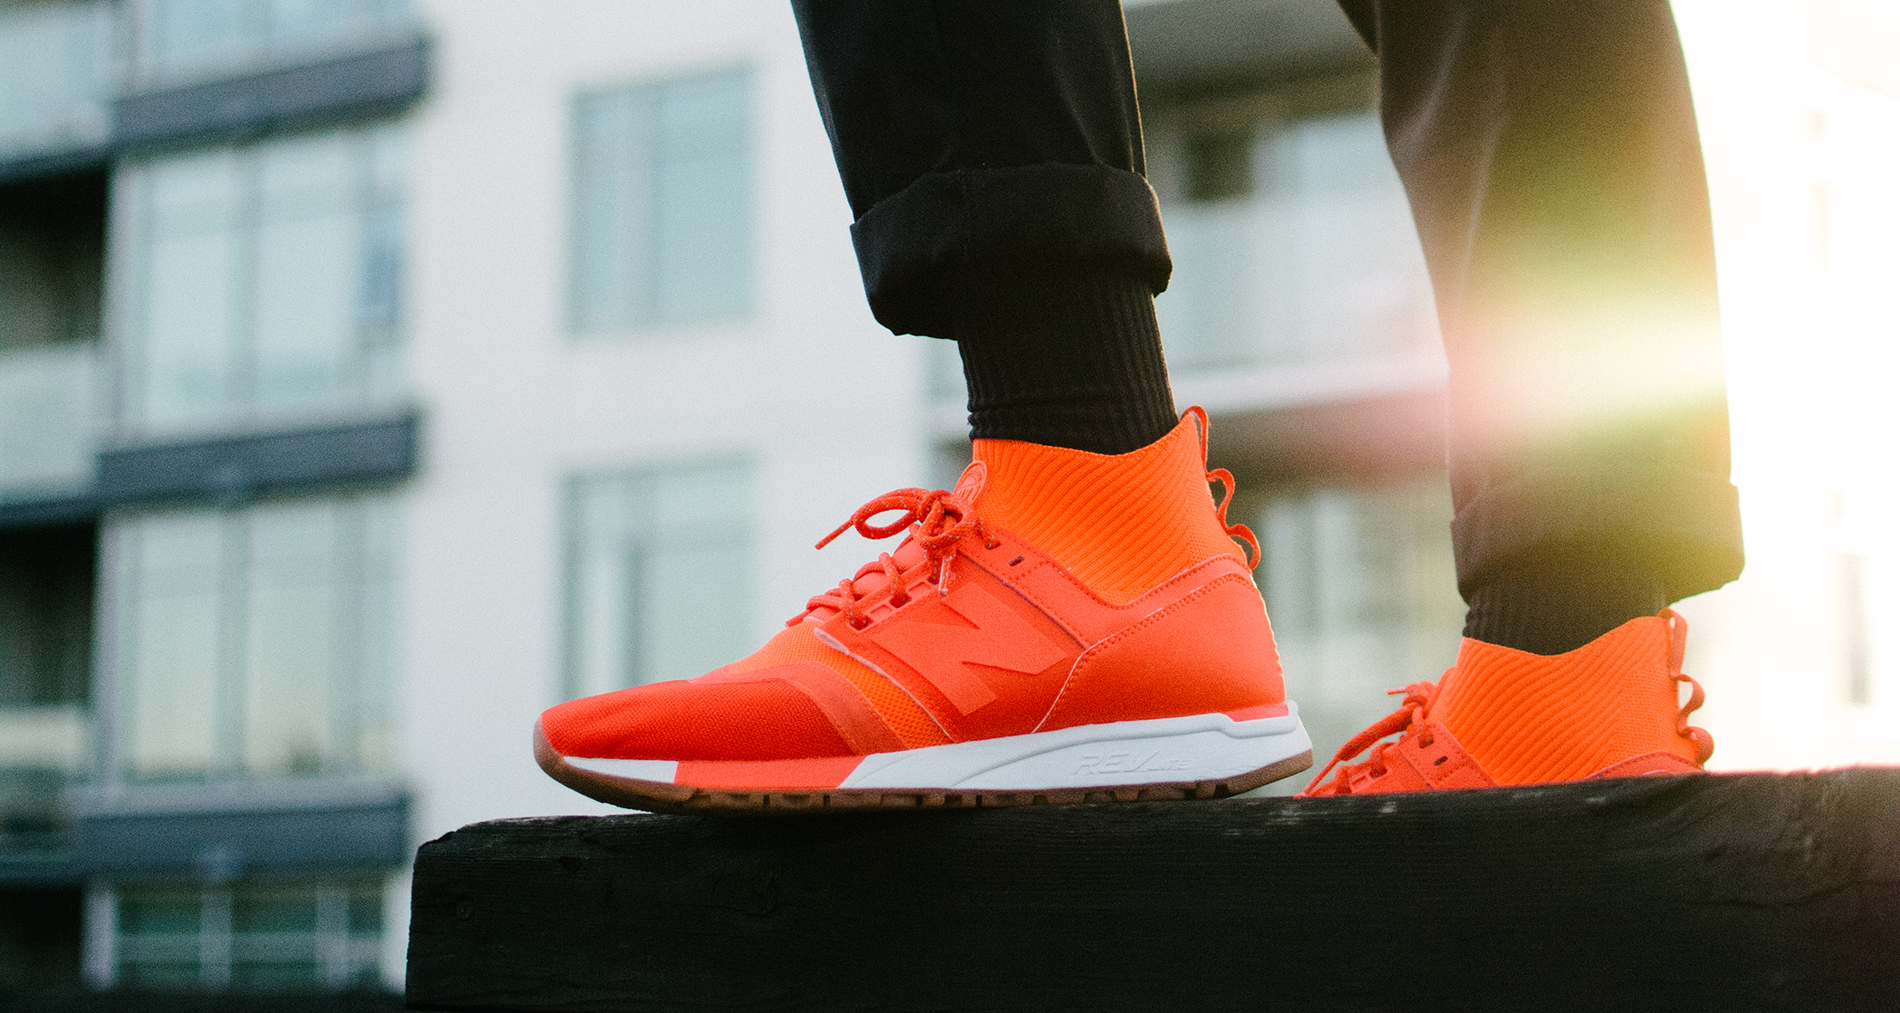 new balance introduces 247 mid nice kicks